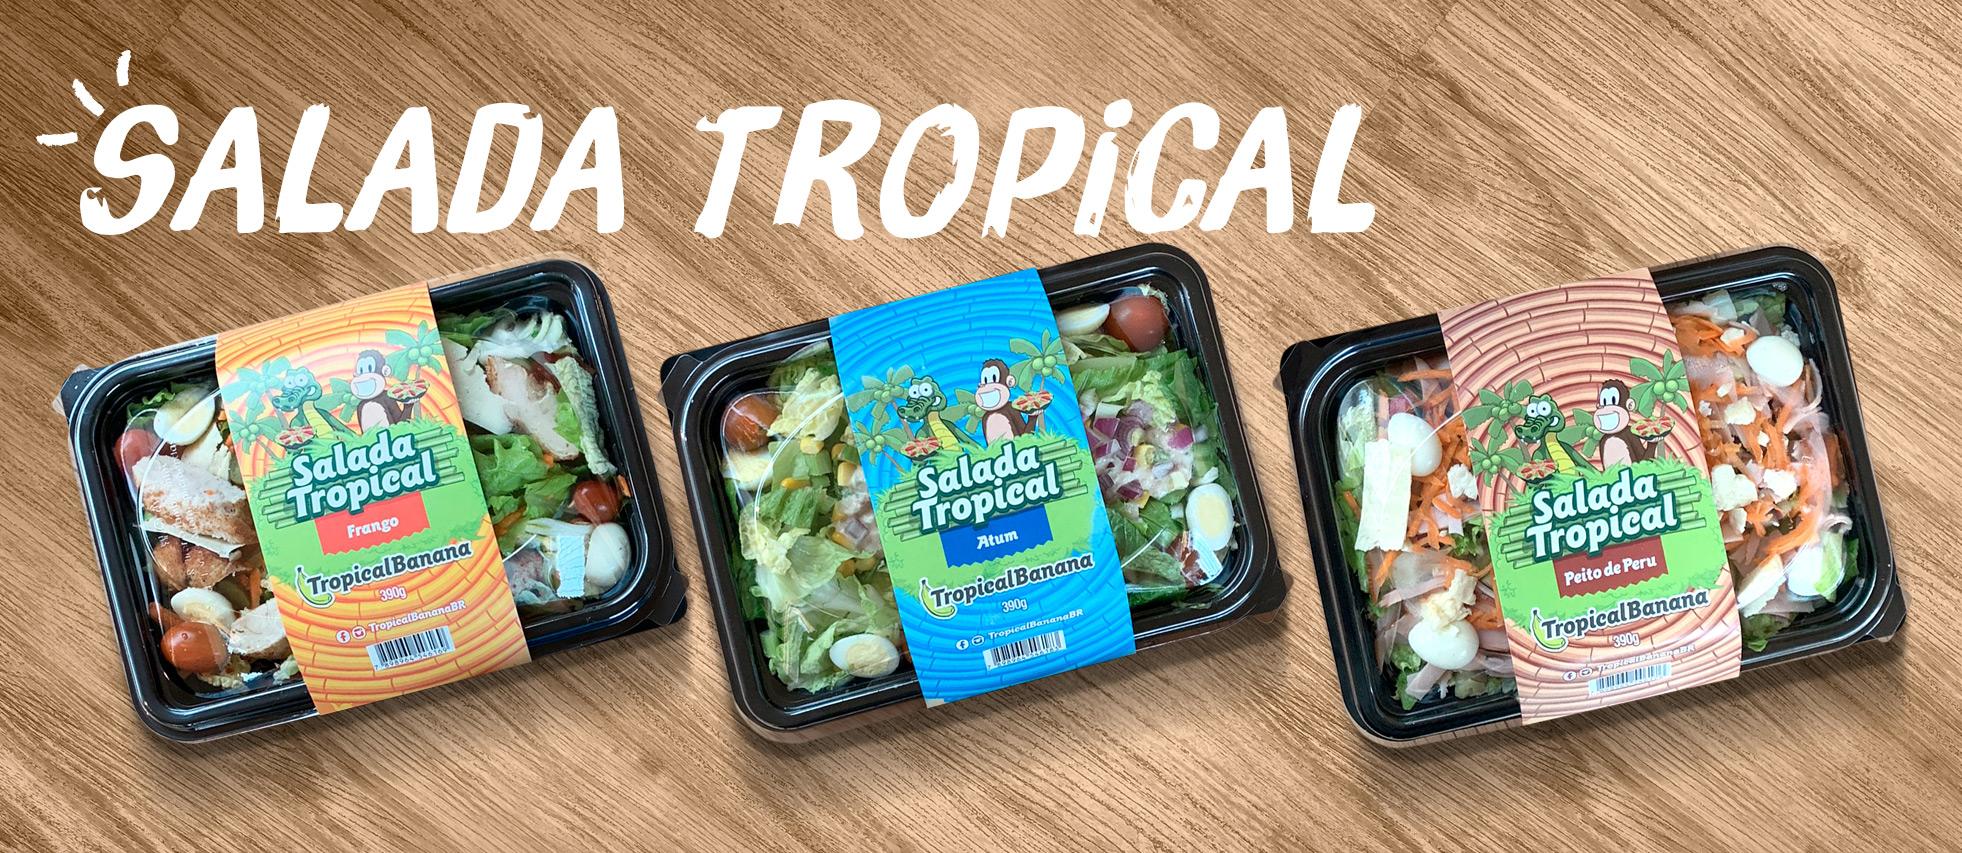 salada tropical banana curitiba